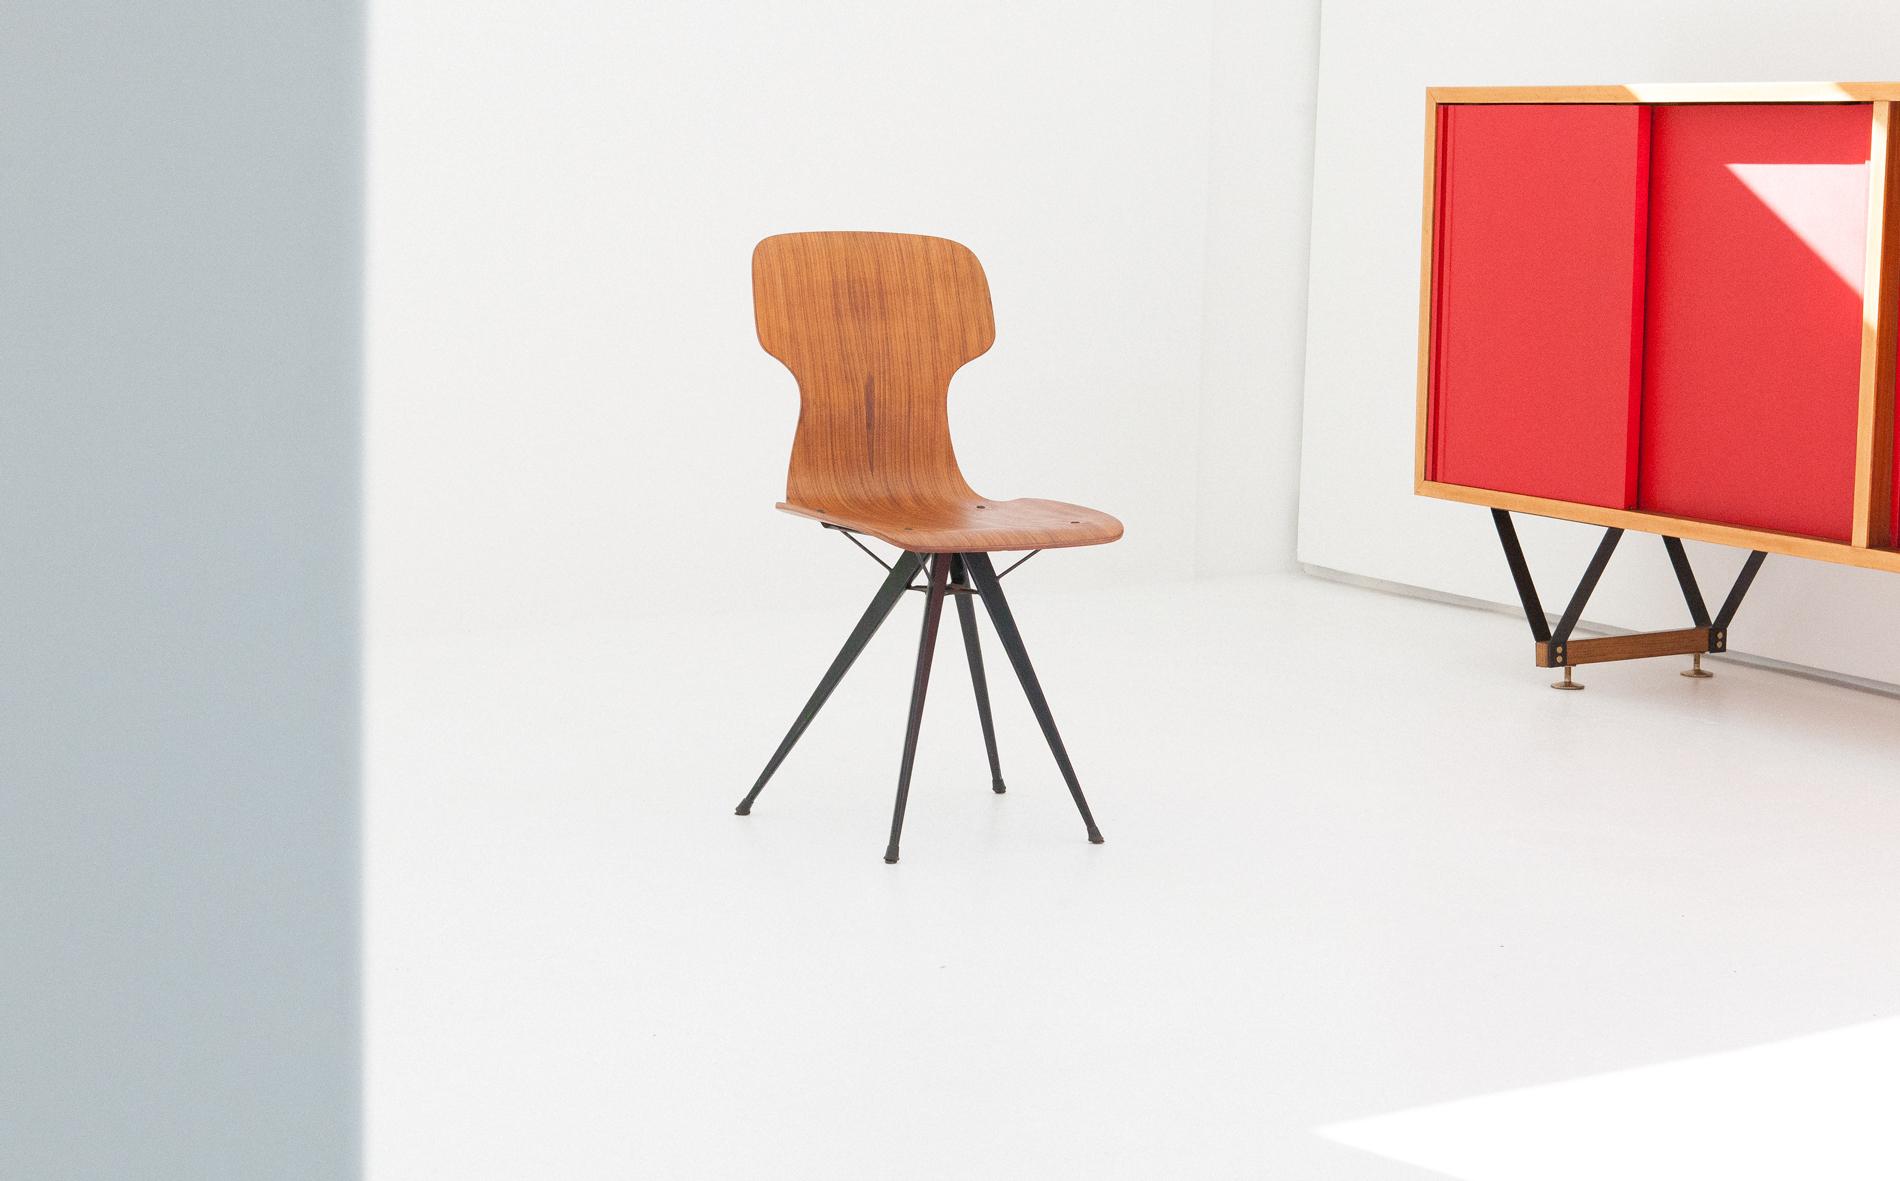 italian-curved-teak-conical-iron-legs-chair-SE284